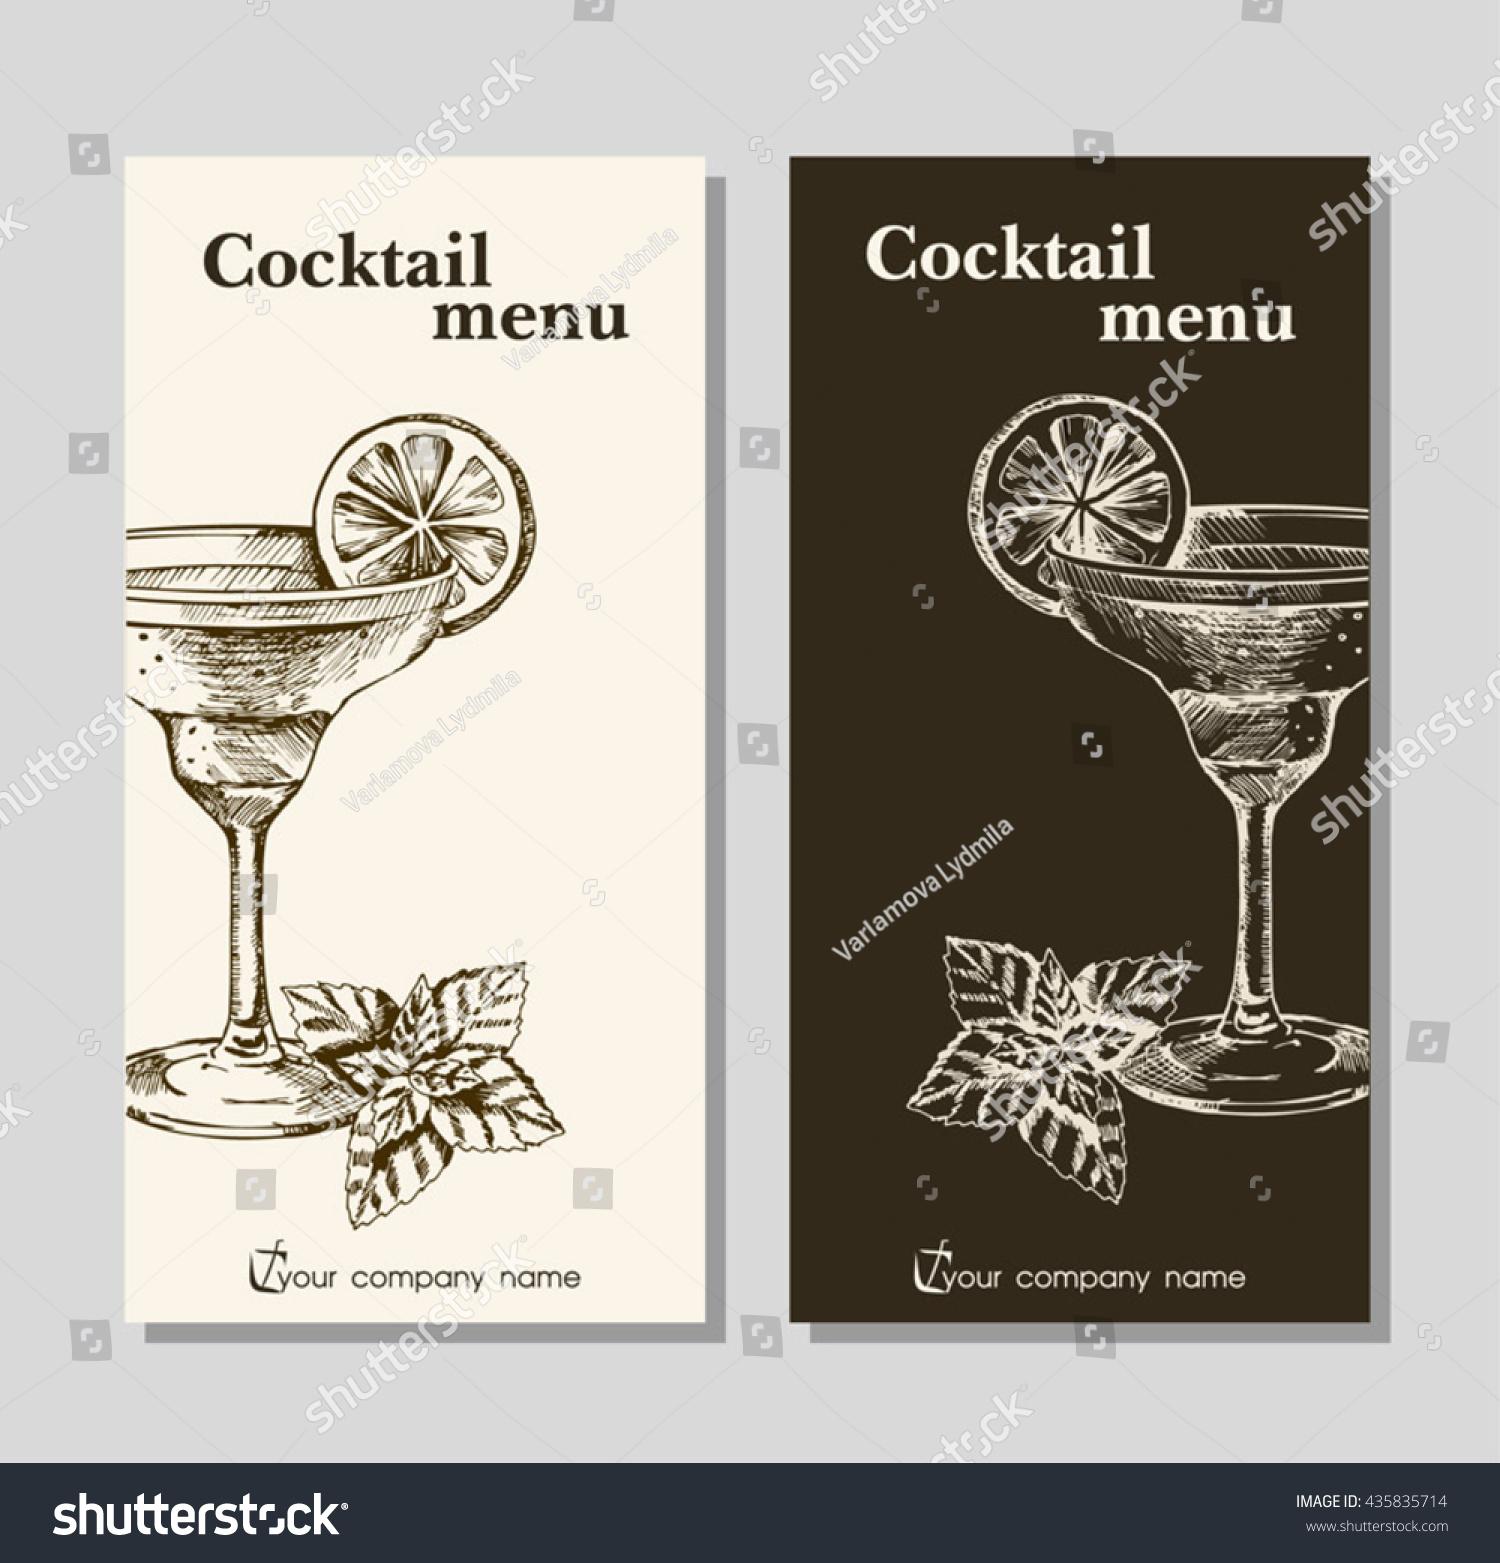 cocktails menu card design template menu stock vector royalty free